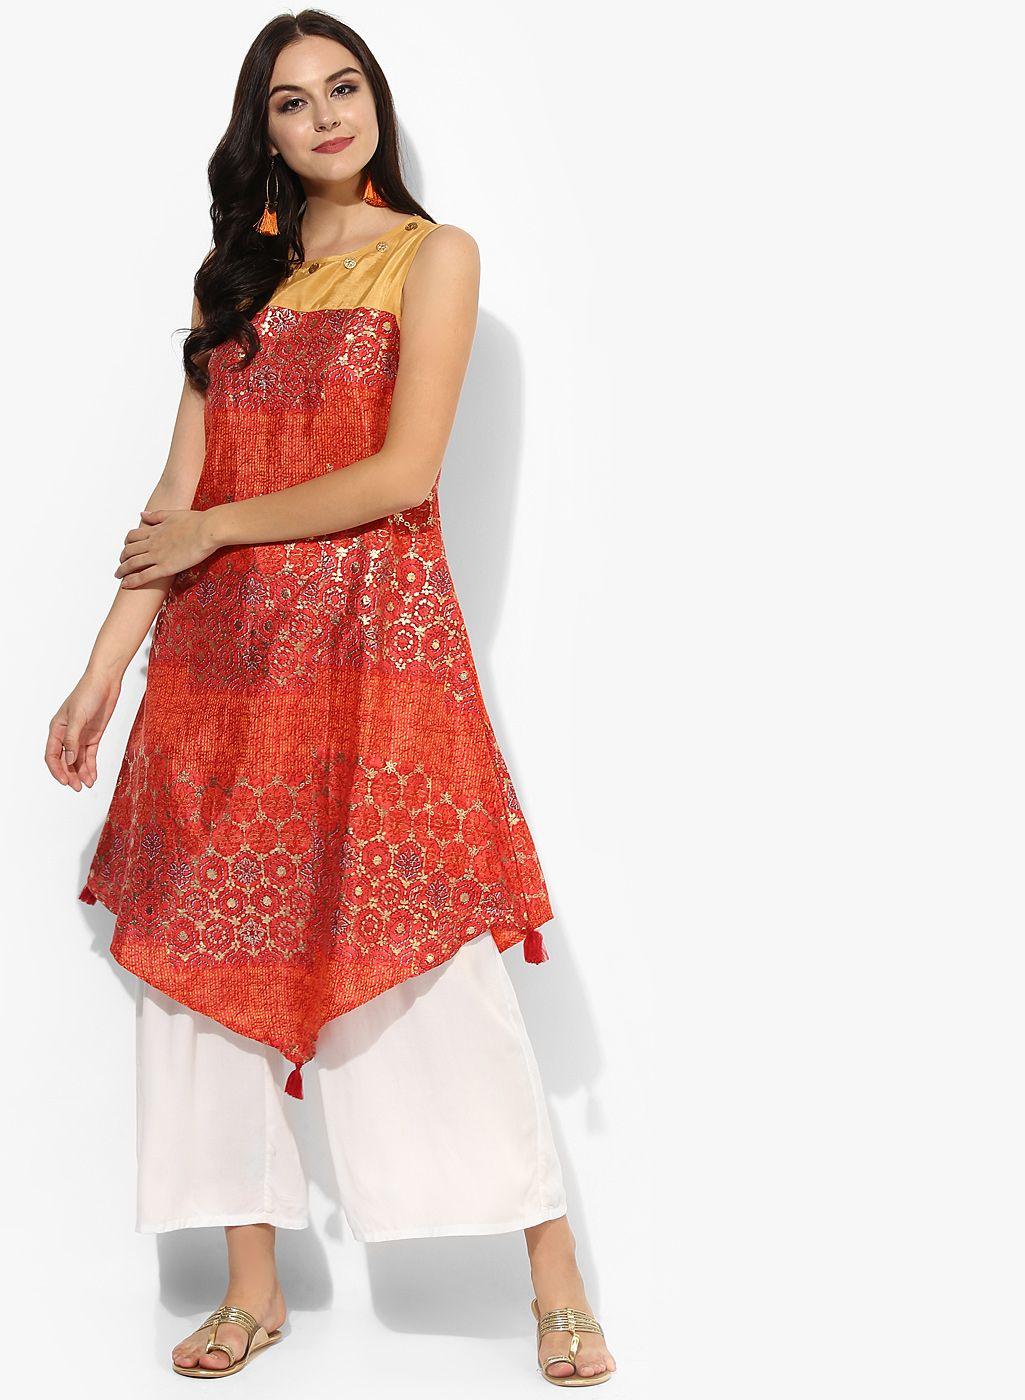 2e799a21bab Akkriti By Pantaloons Orange Asymmetrical Tunic  Pantaloons  Orange   Asymmetrical  Tunic  Kurta  Kurtis  Casual  Polyester  Printed